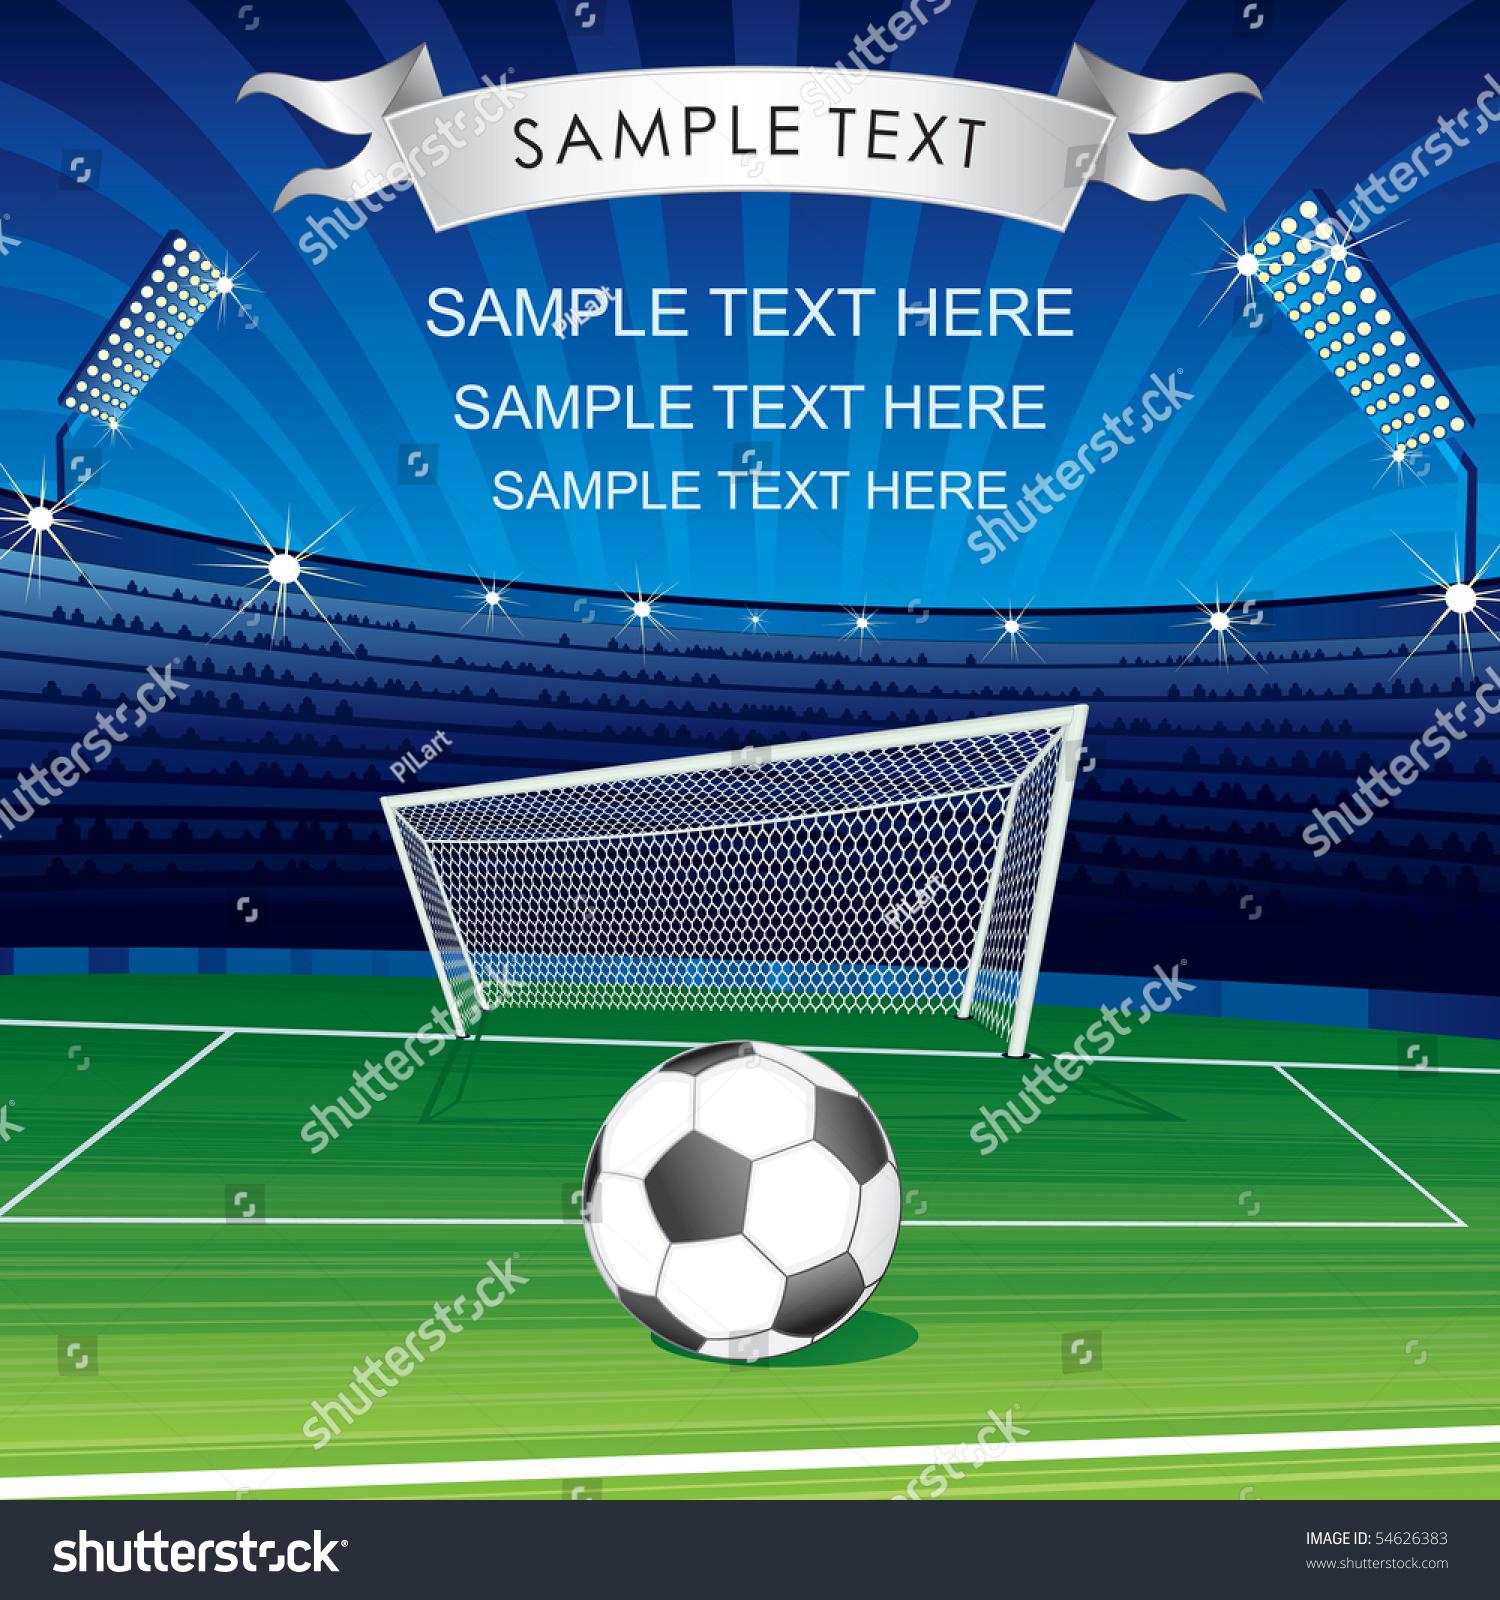 Football Champions League Theme Vector Poster Stock Vector